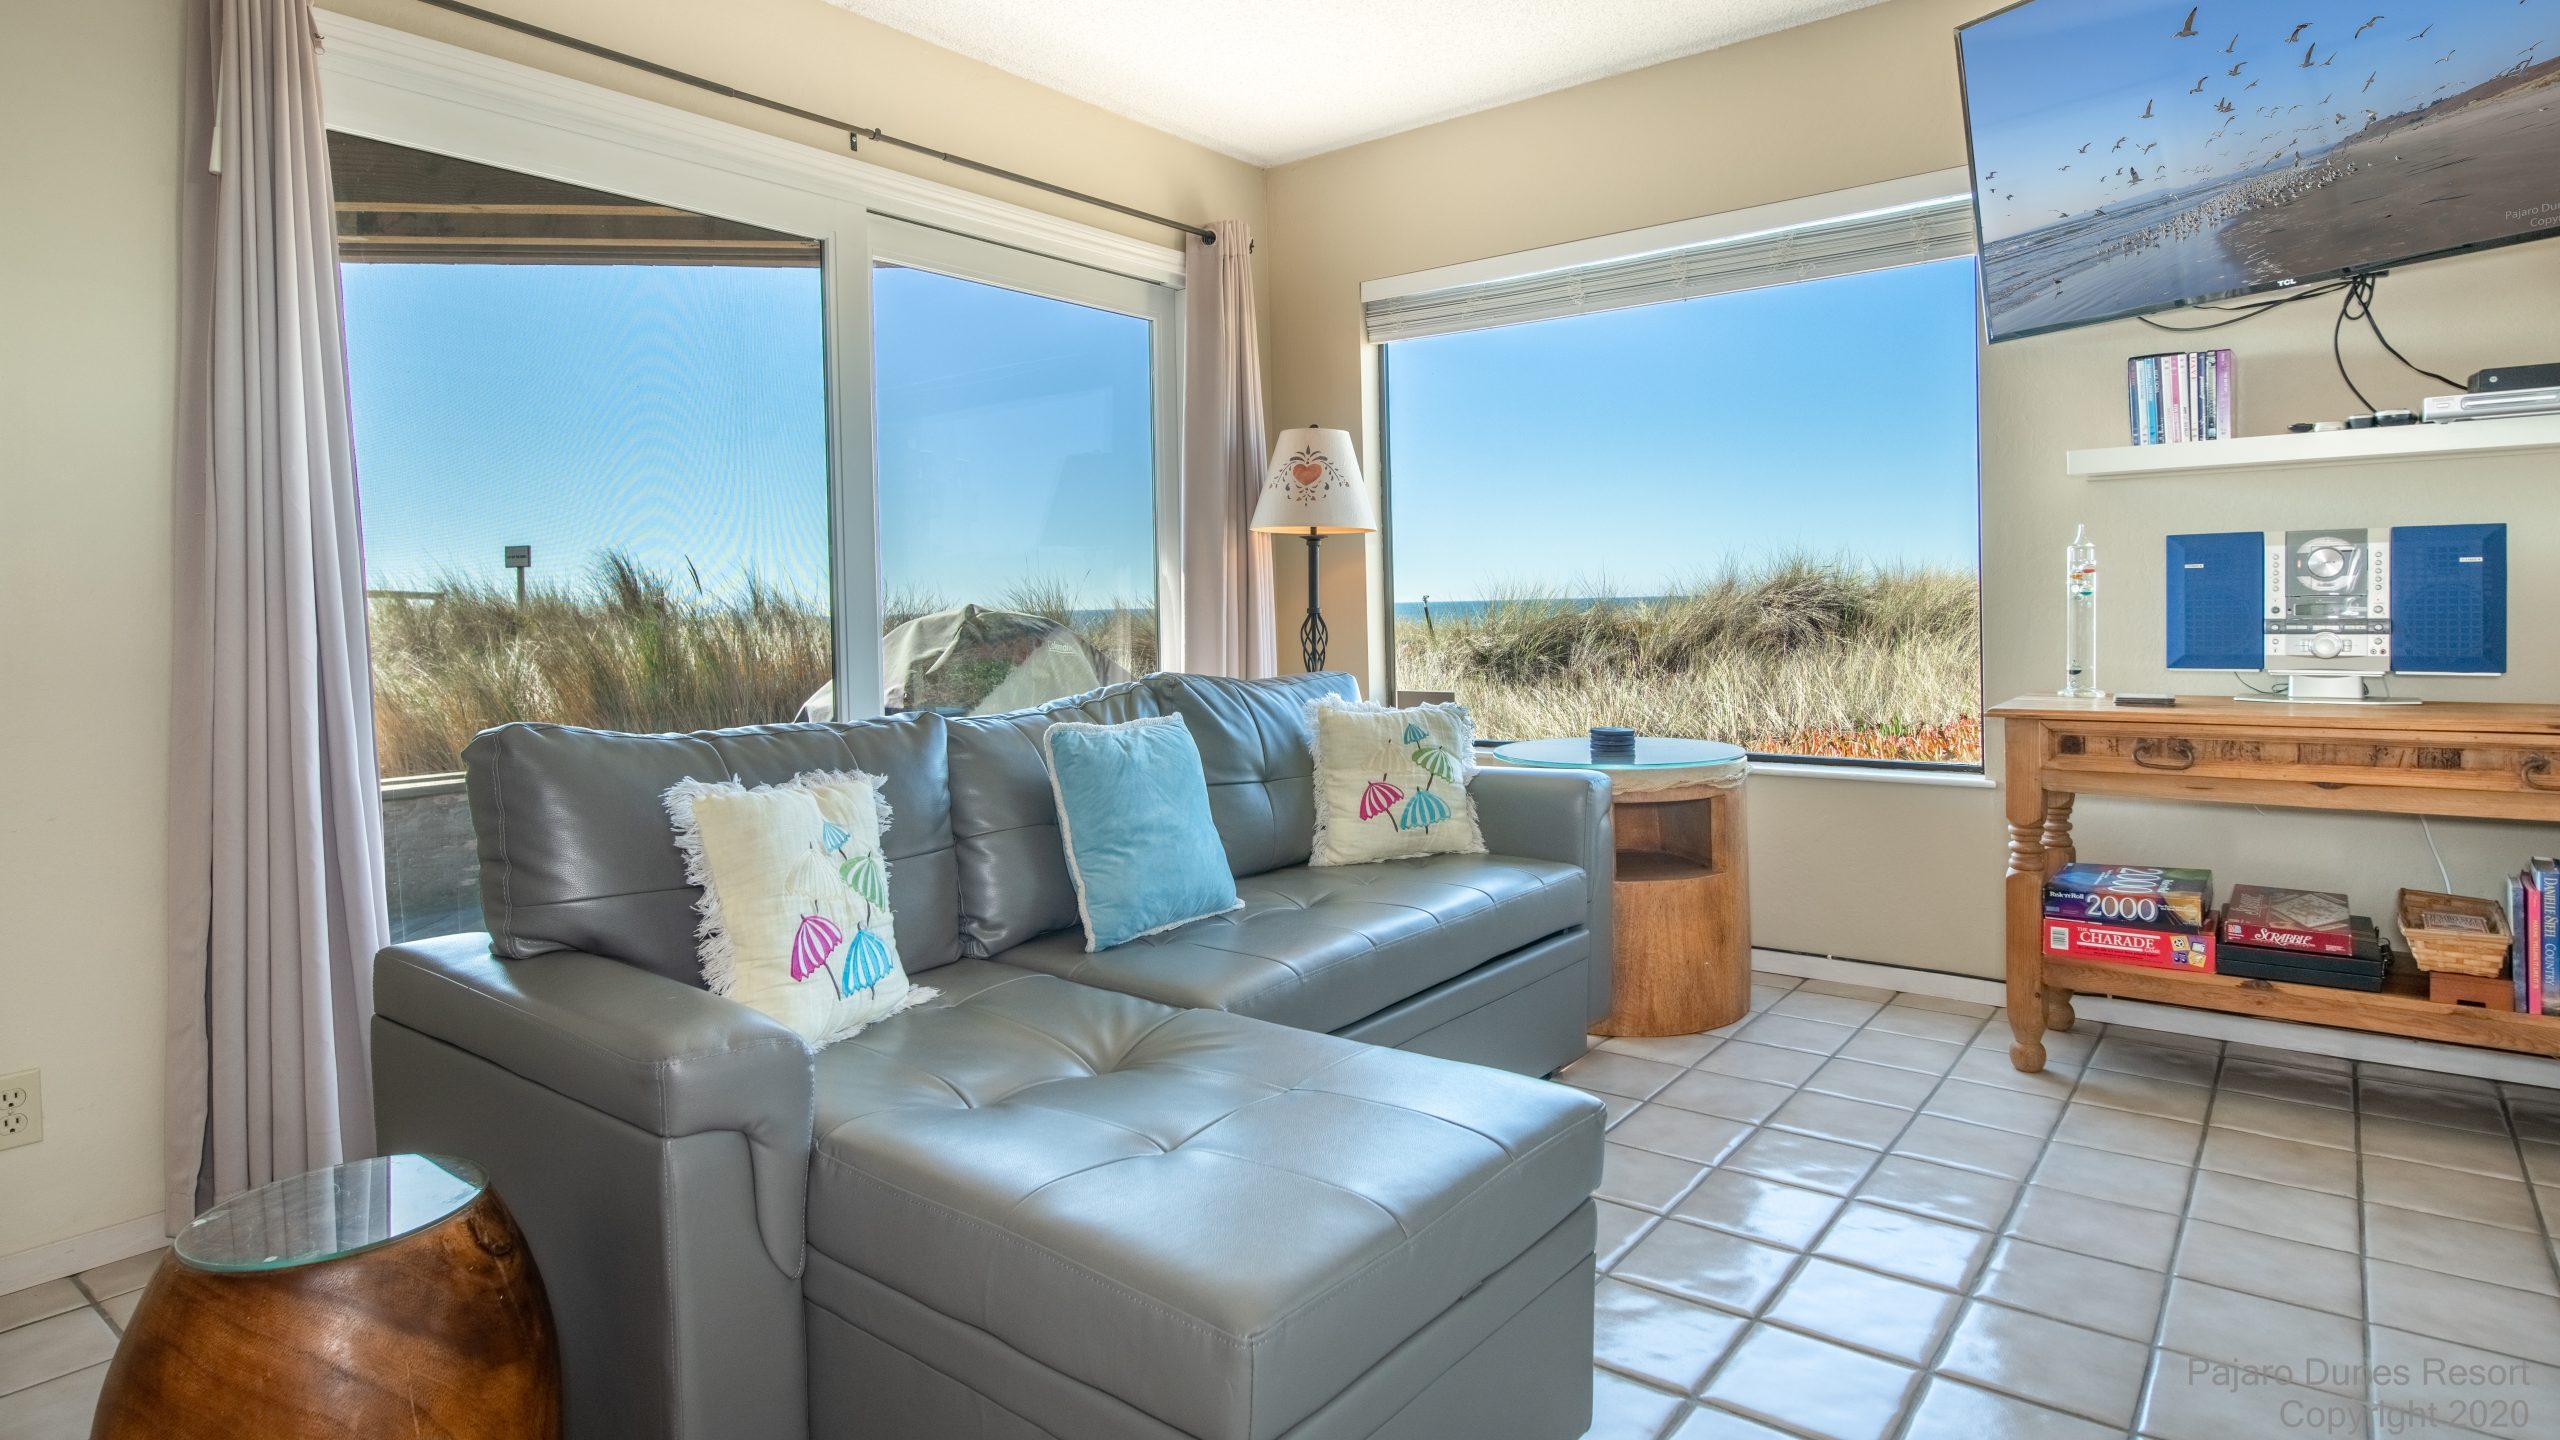 Pajaro Dunes Shorebirds 247